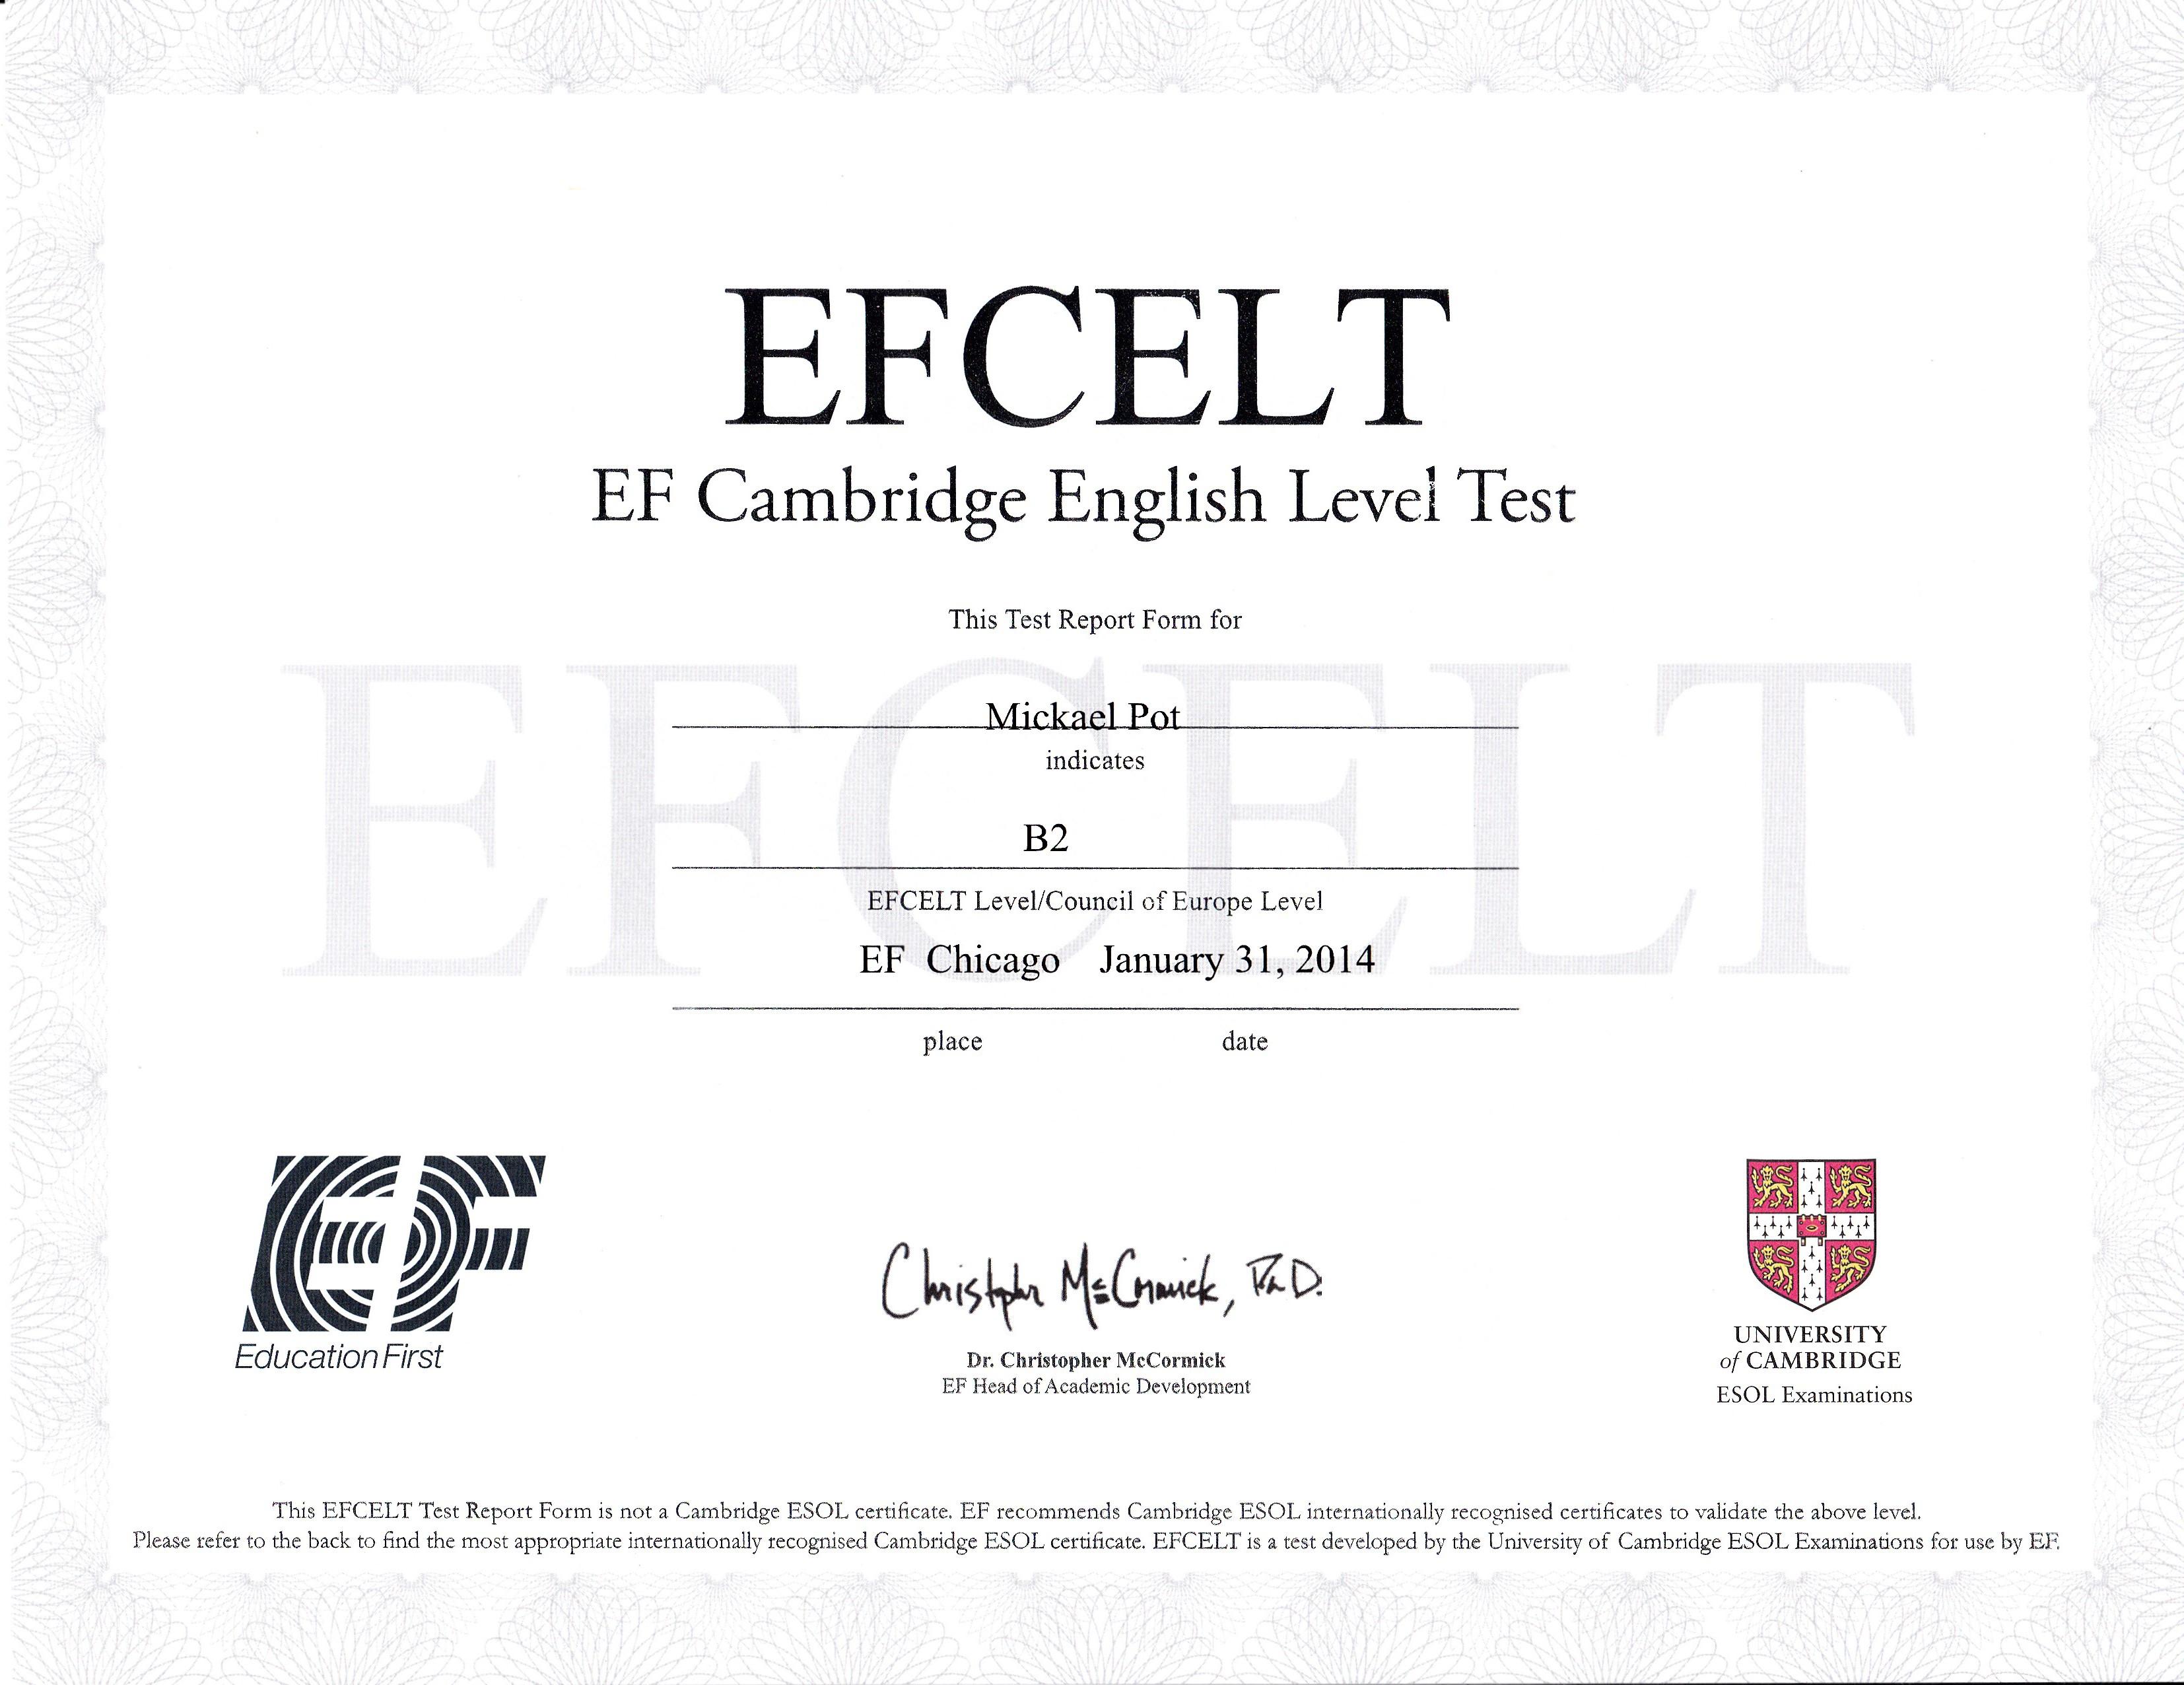 certificat niveau d u0026 39 anglais - cv